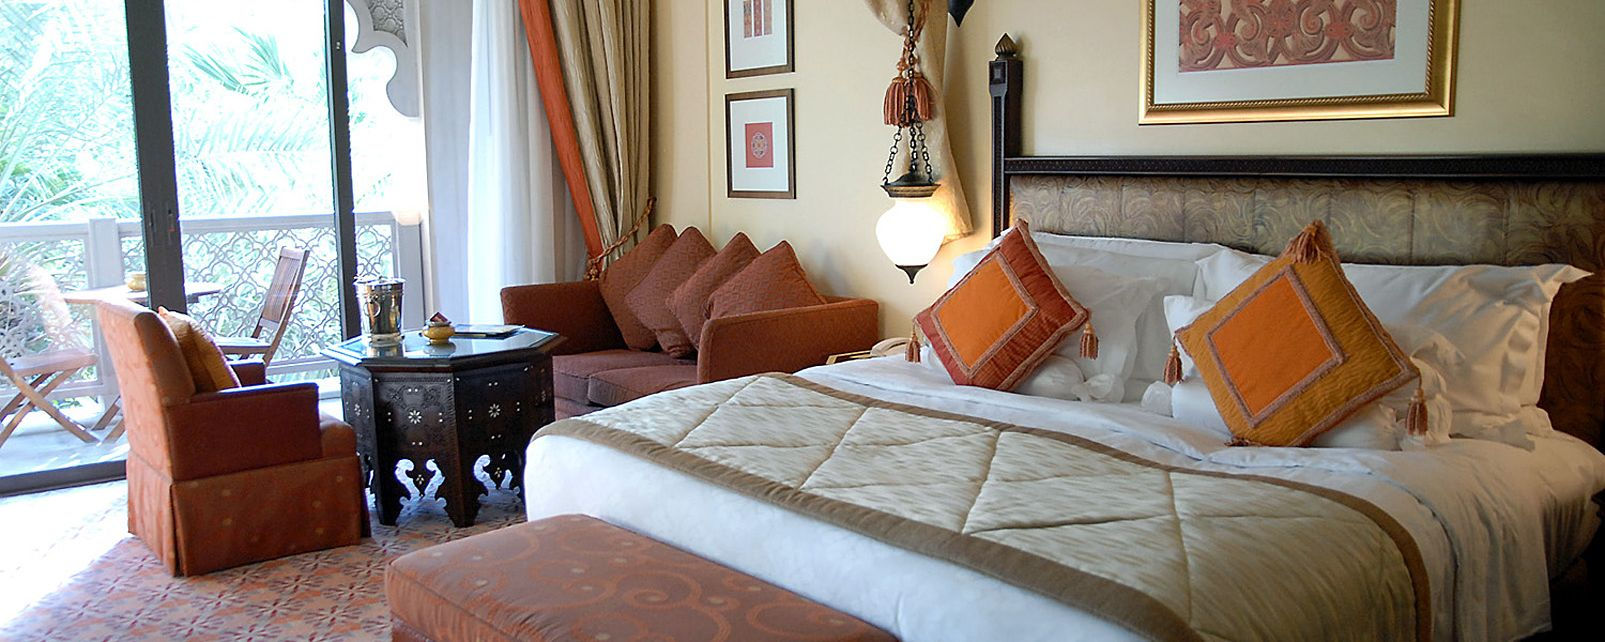 Hotel Madinat Mina A'Salam